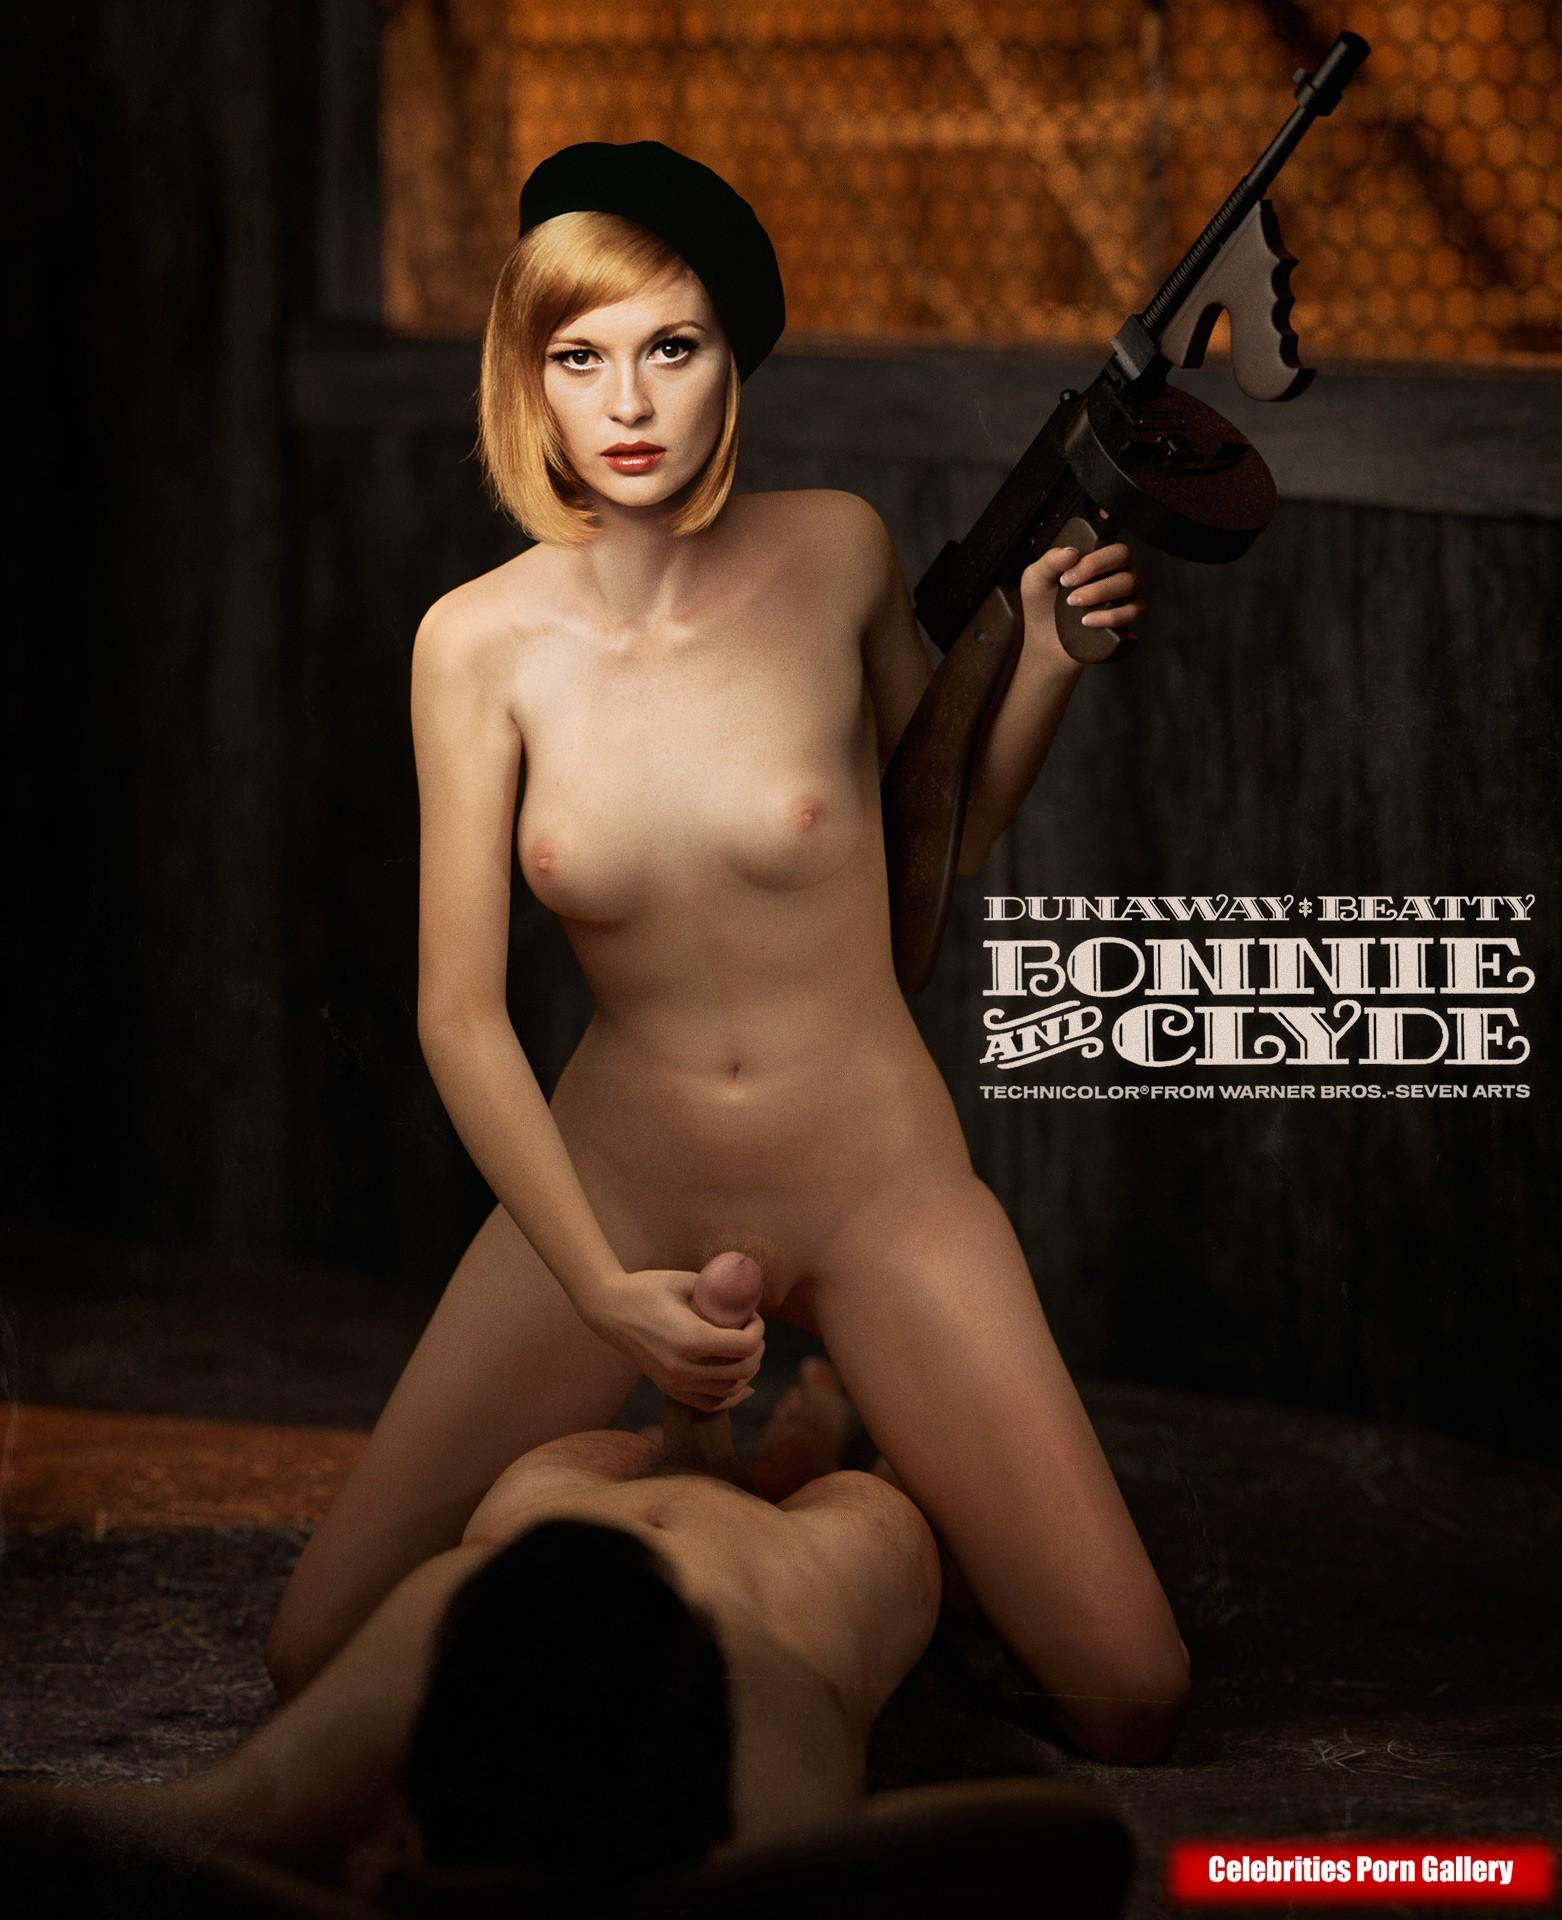 Unexpectedness! faye dunaway nude amusing